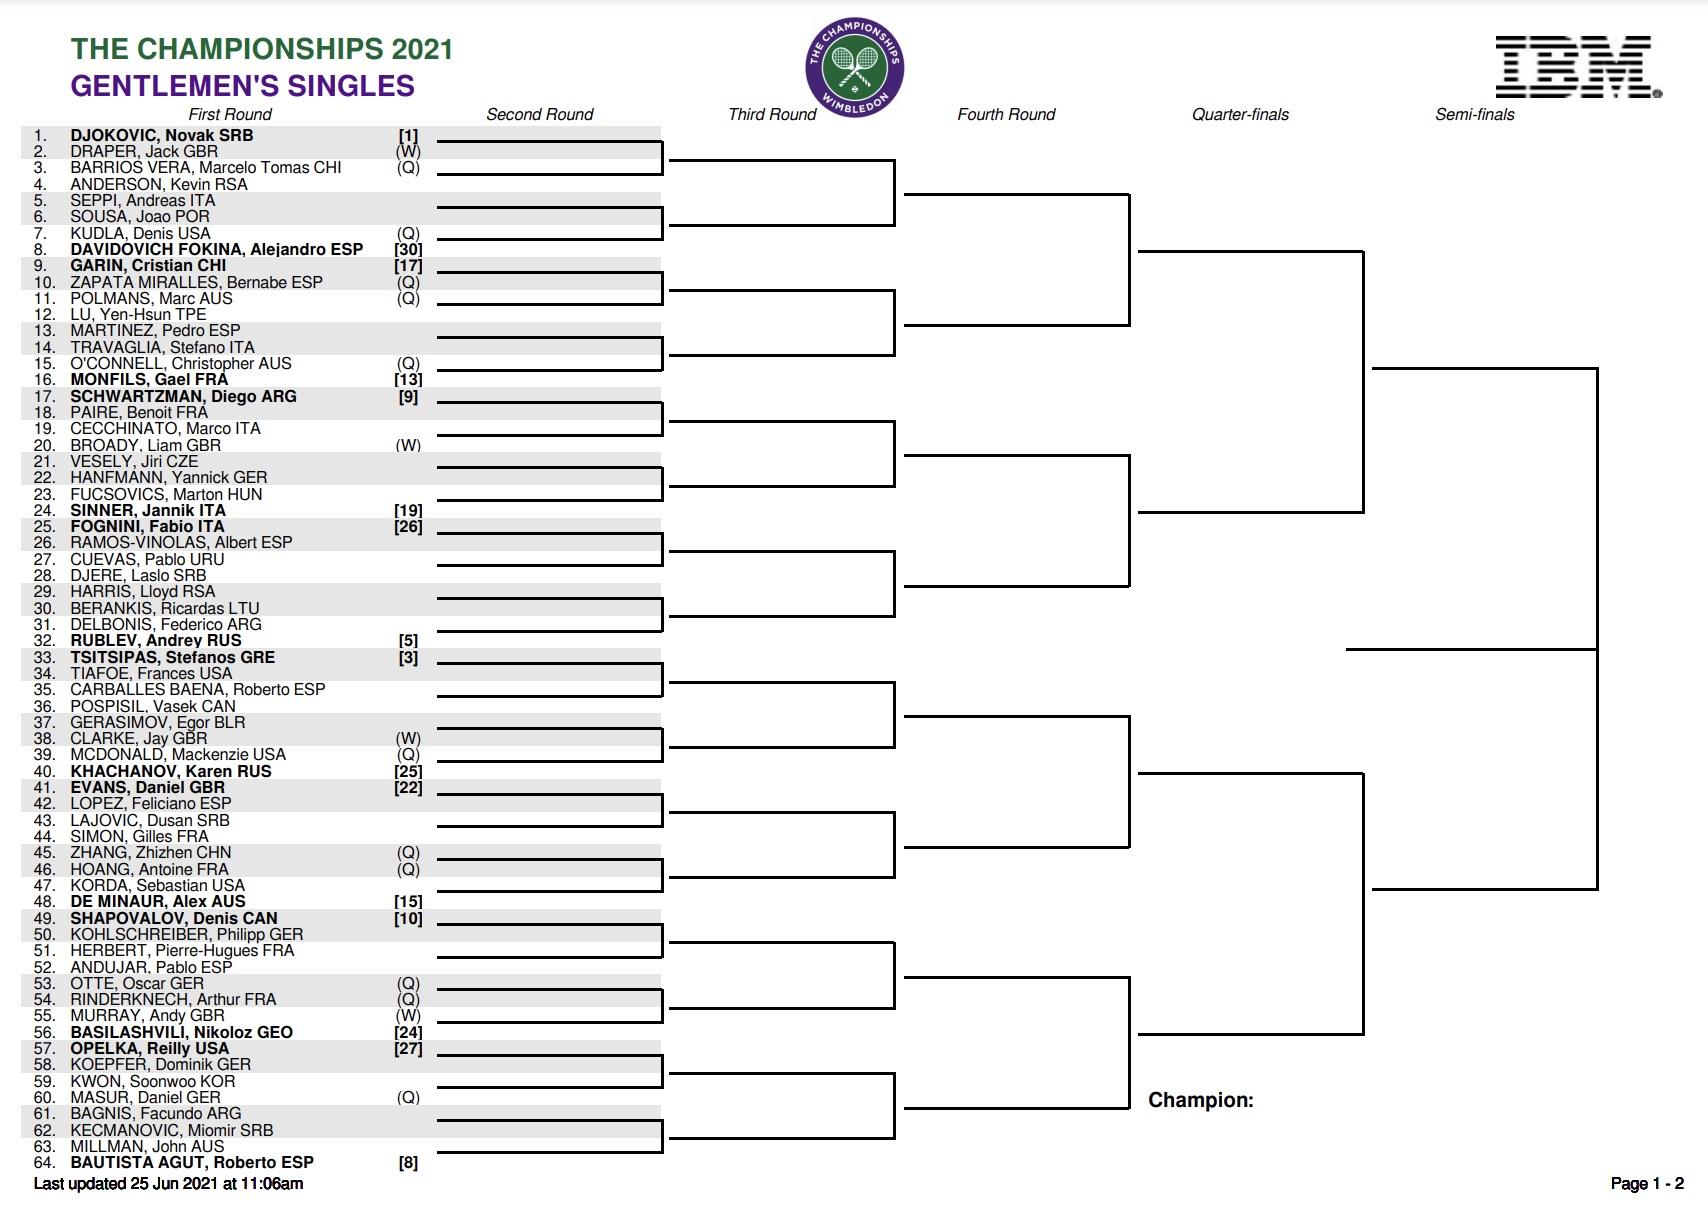 Wimbledon 2021 Men's Singles Draw Top Half